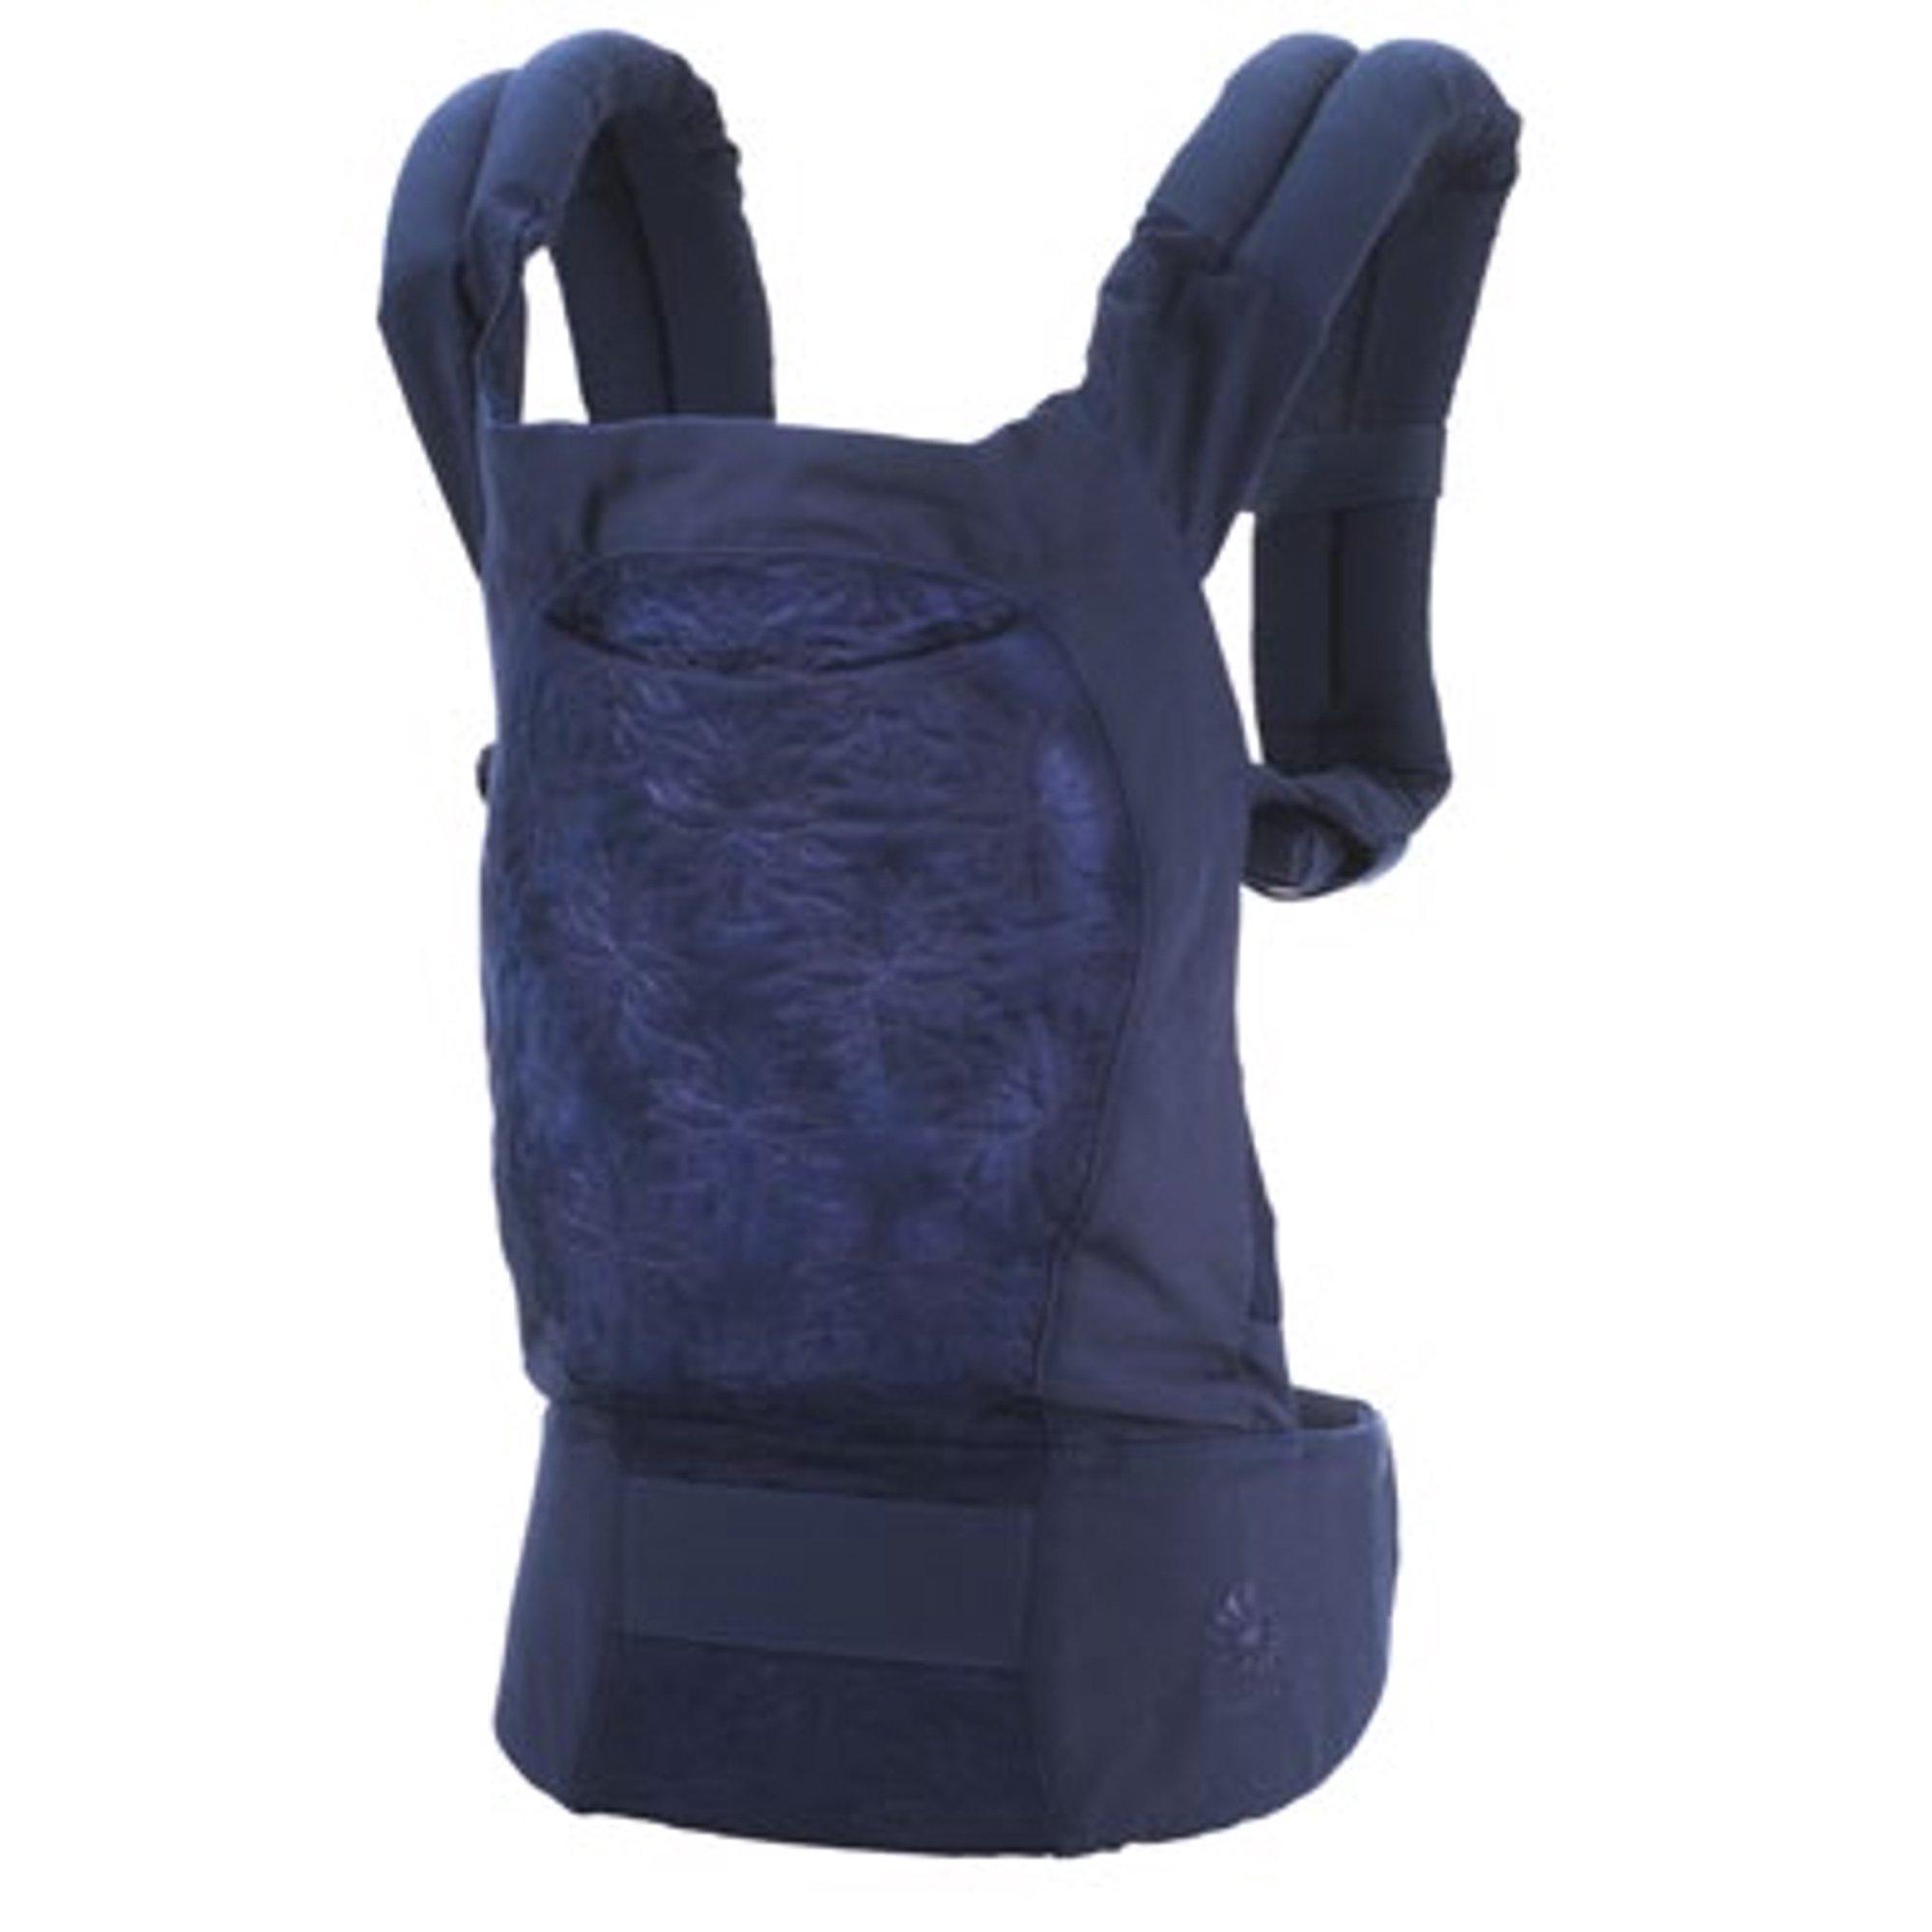 67dd90d4979 Buy Ergo Baby Designer Collection Carrier Blue Lotus